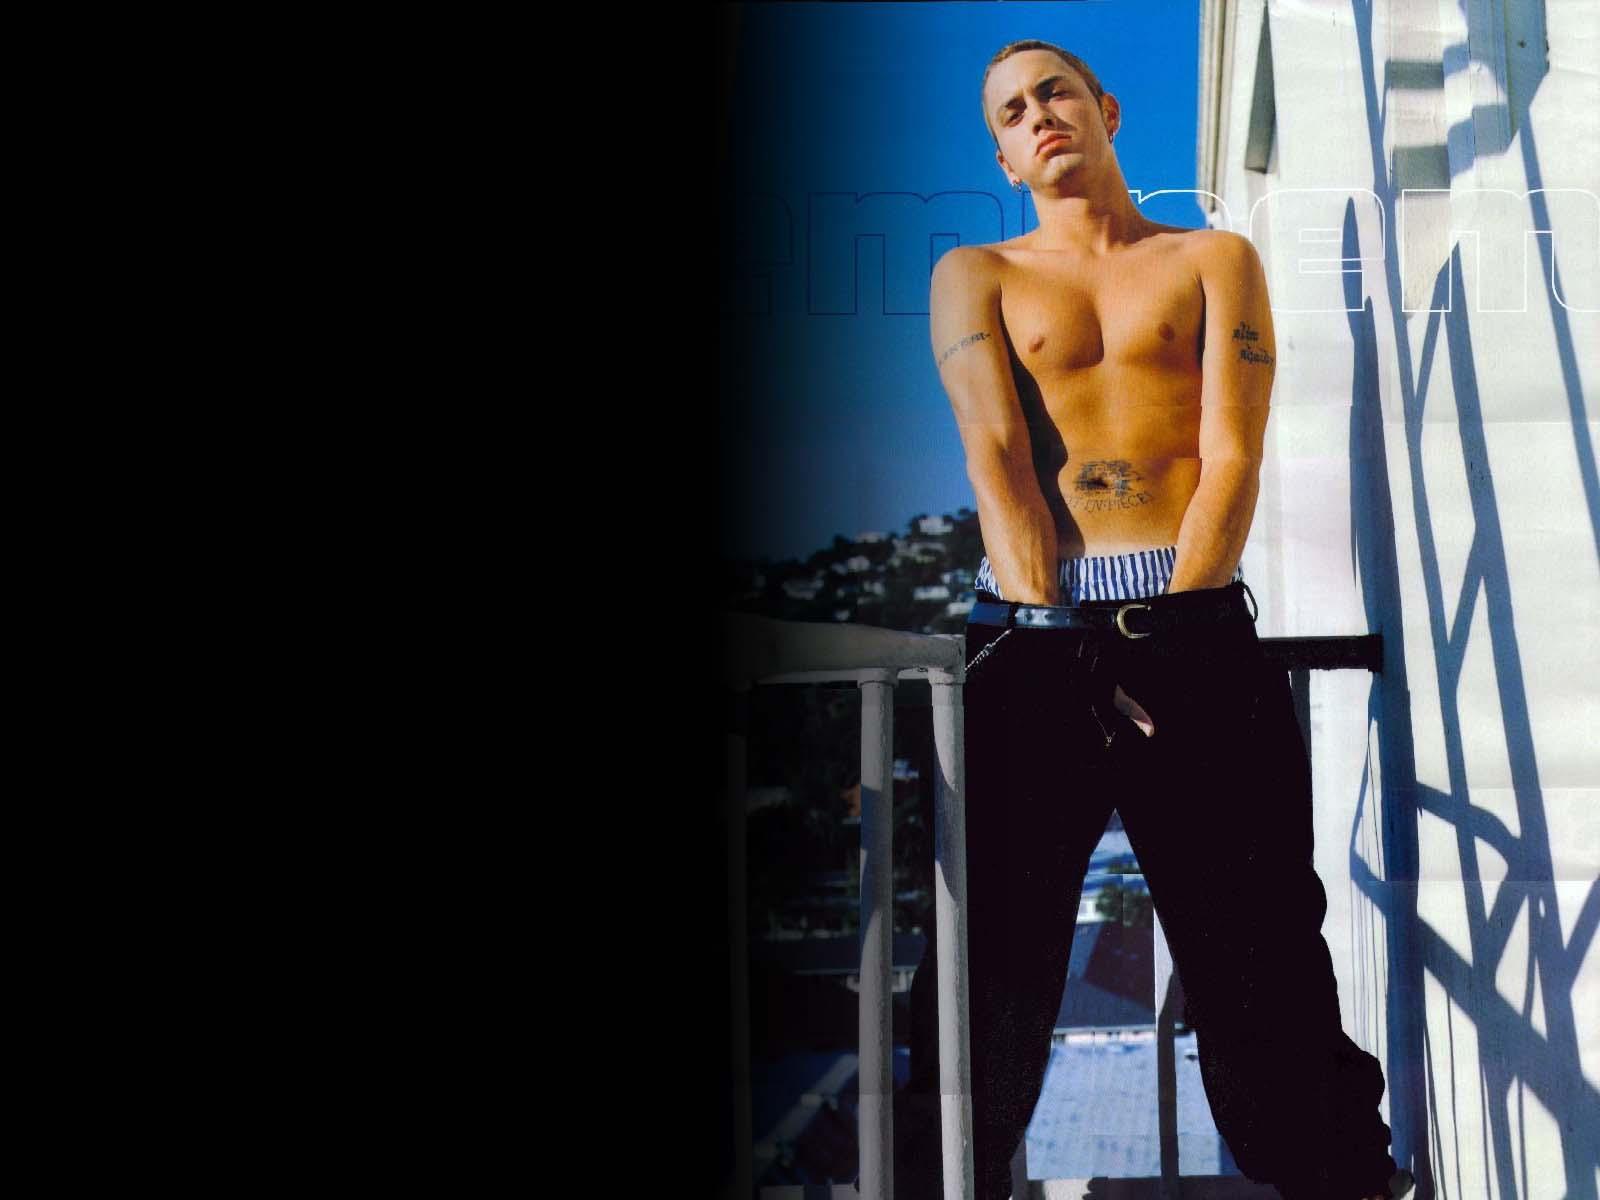 Eminem-Backgrounds-Picture-Free-Download-wallpaper-wp3405217